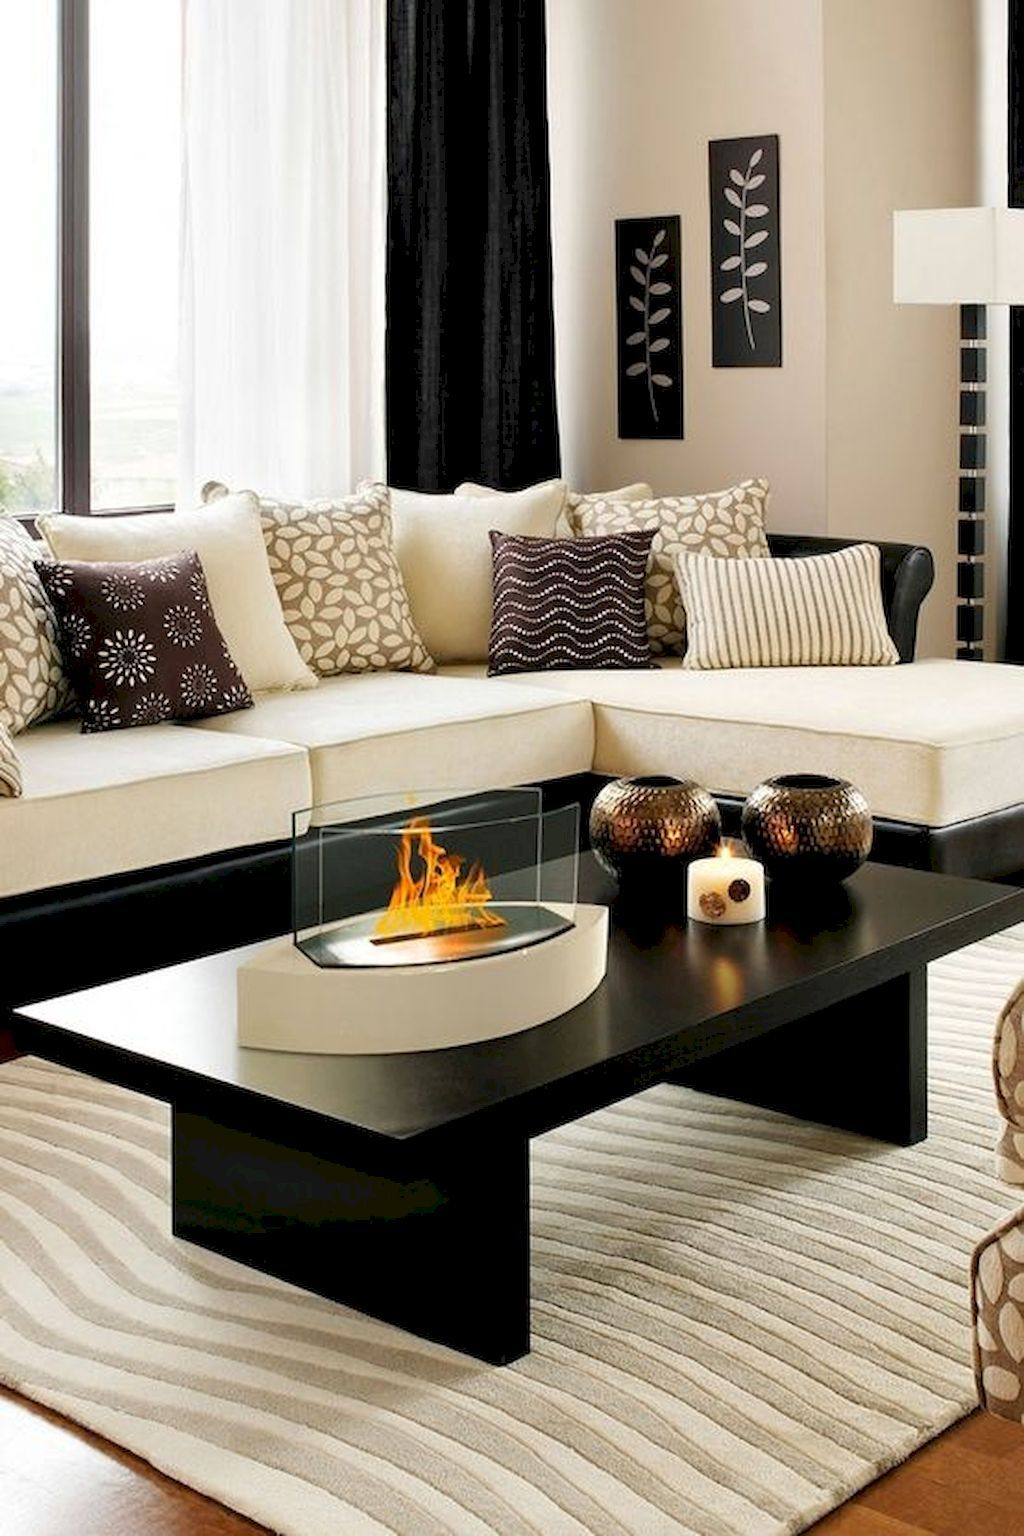 Interior home decorating ideas living room  cozy modern living room decorating ideas  living room decorating